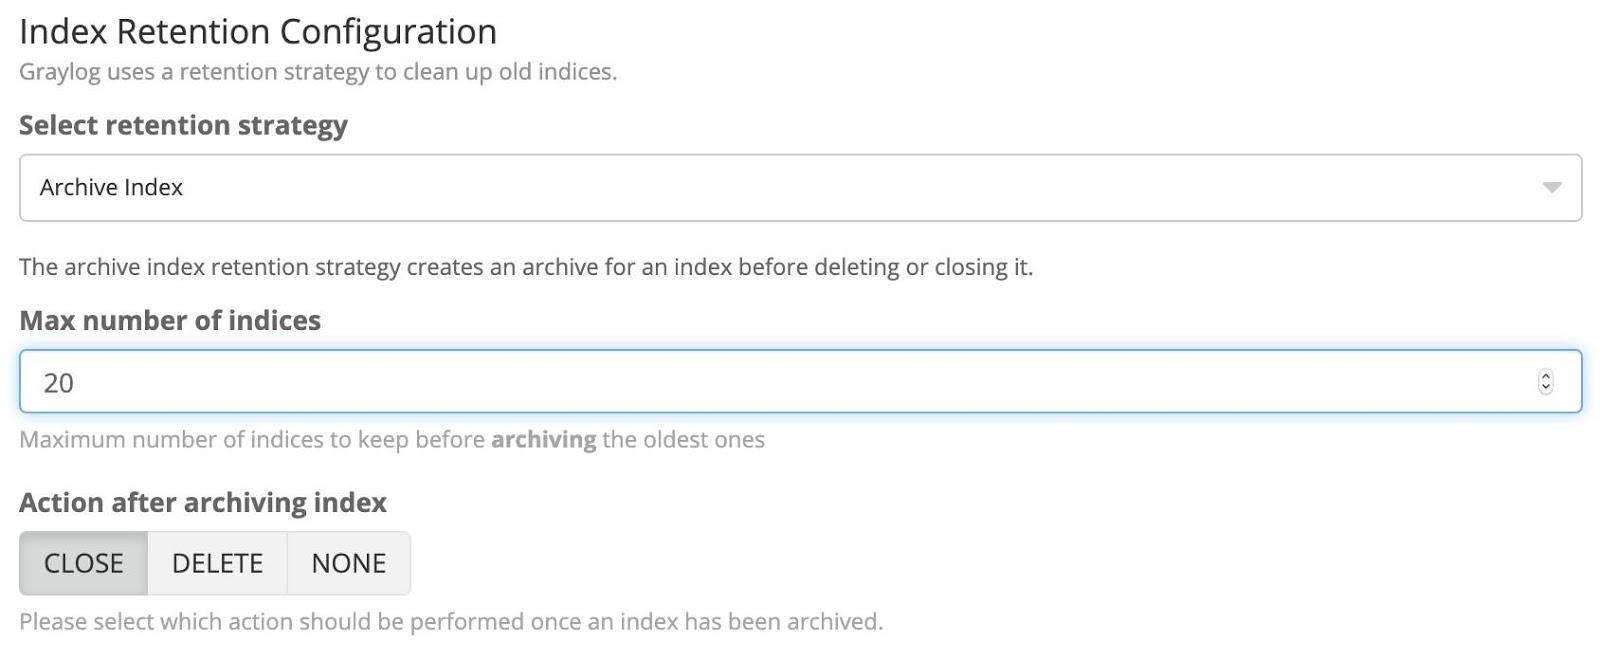 Index Retention Rotation